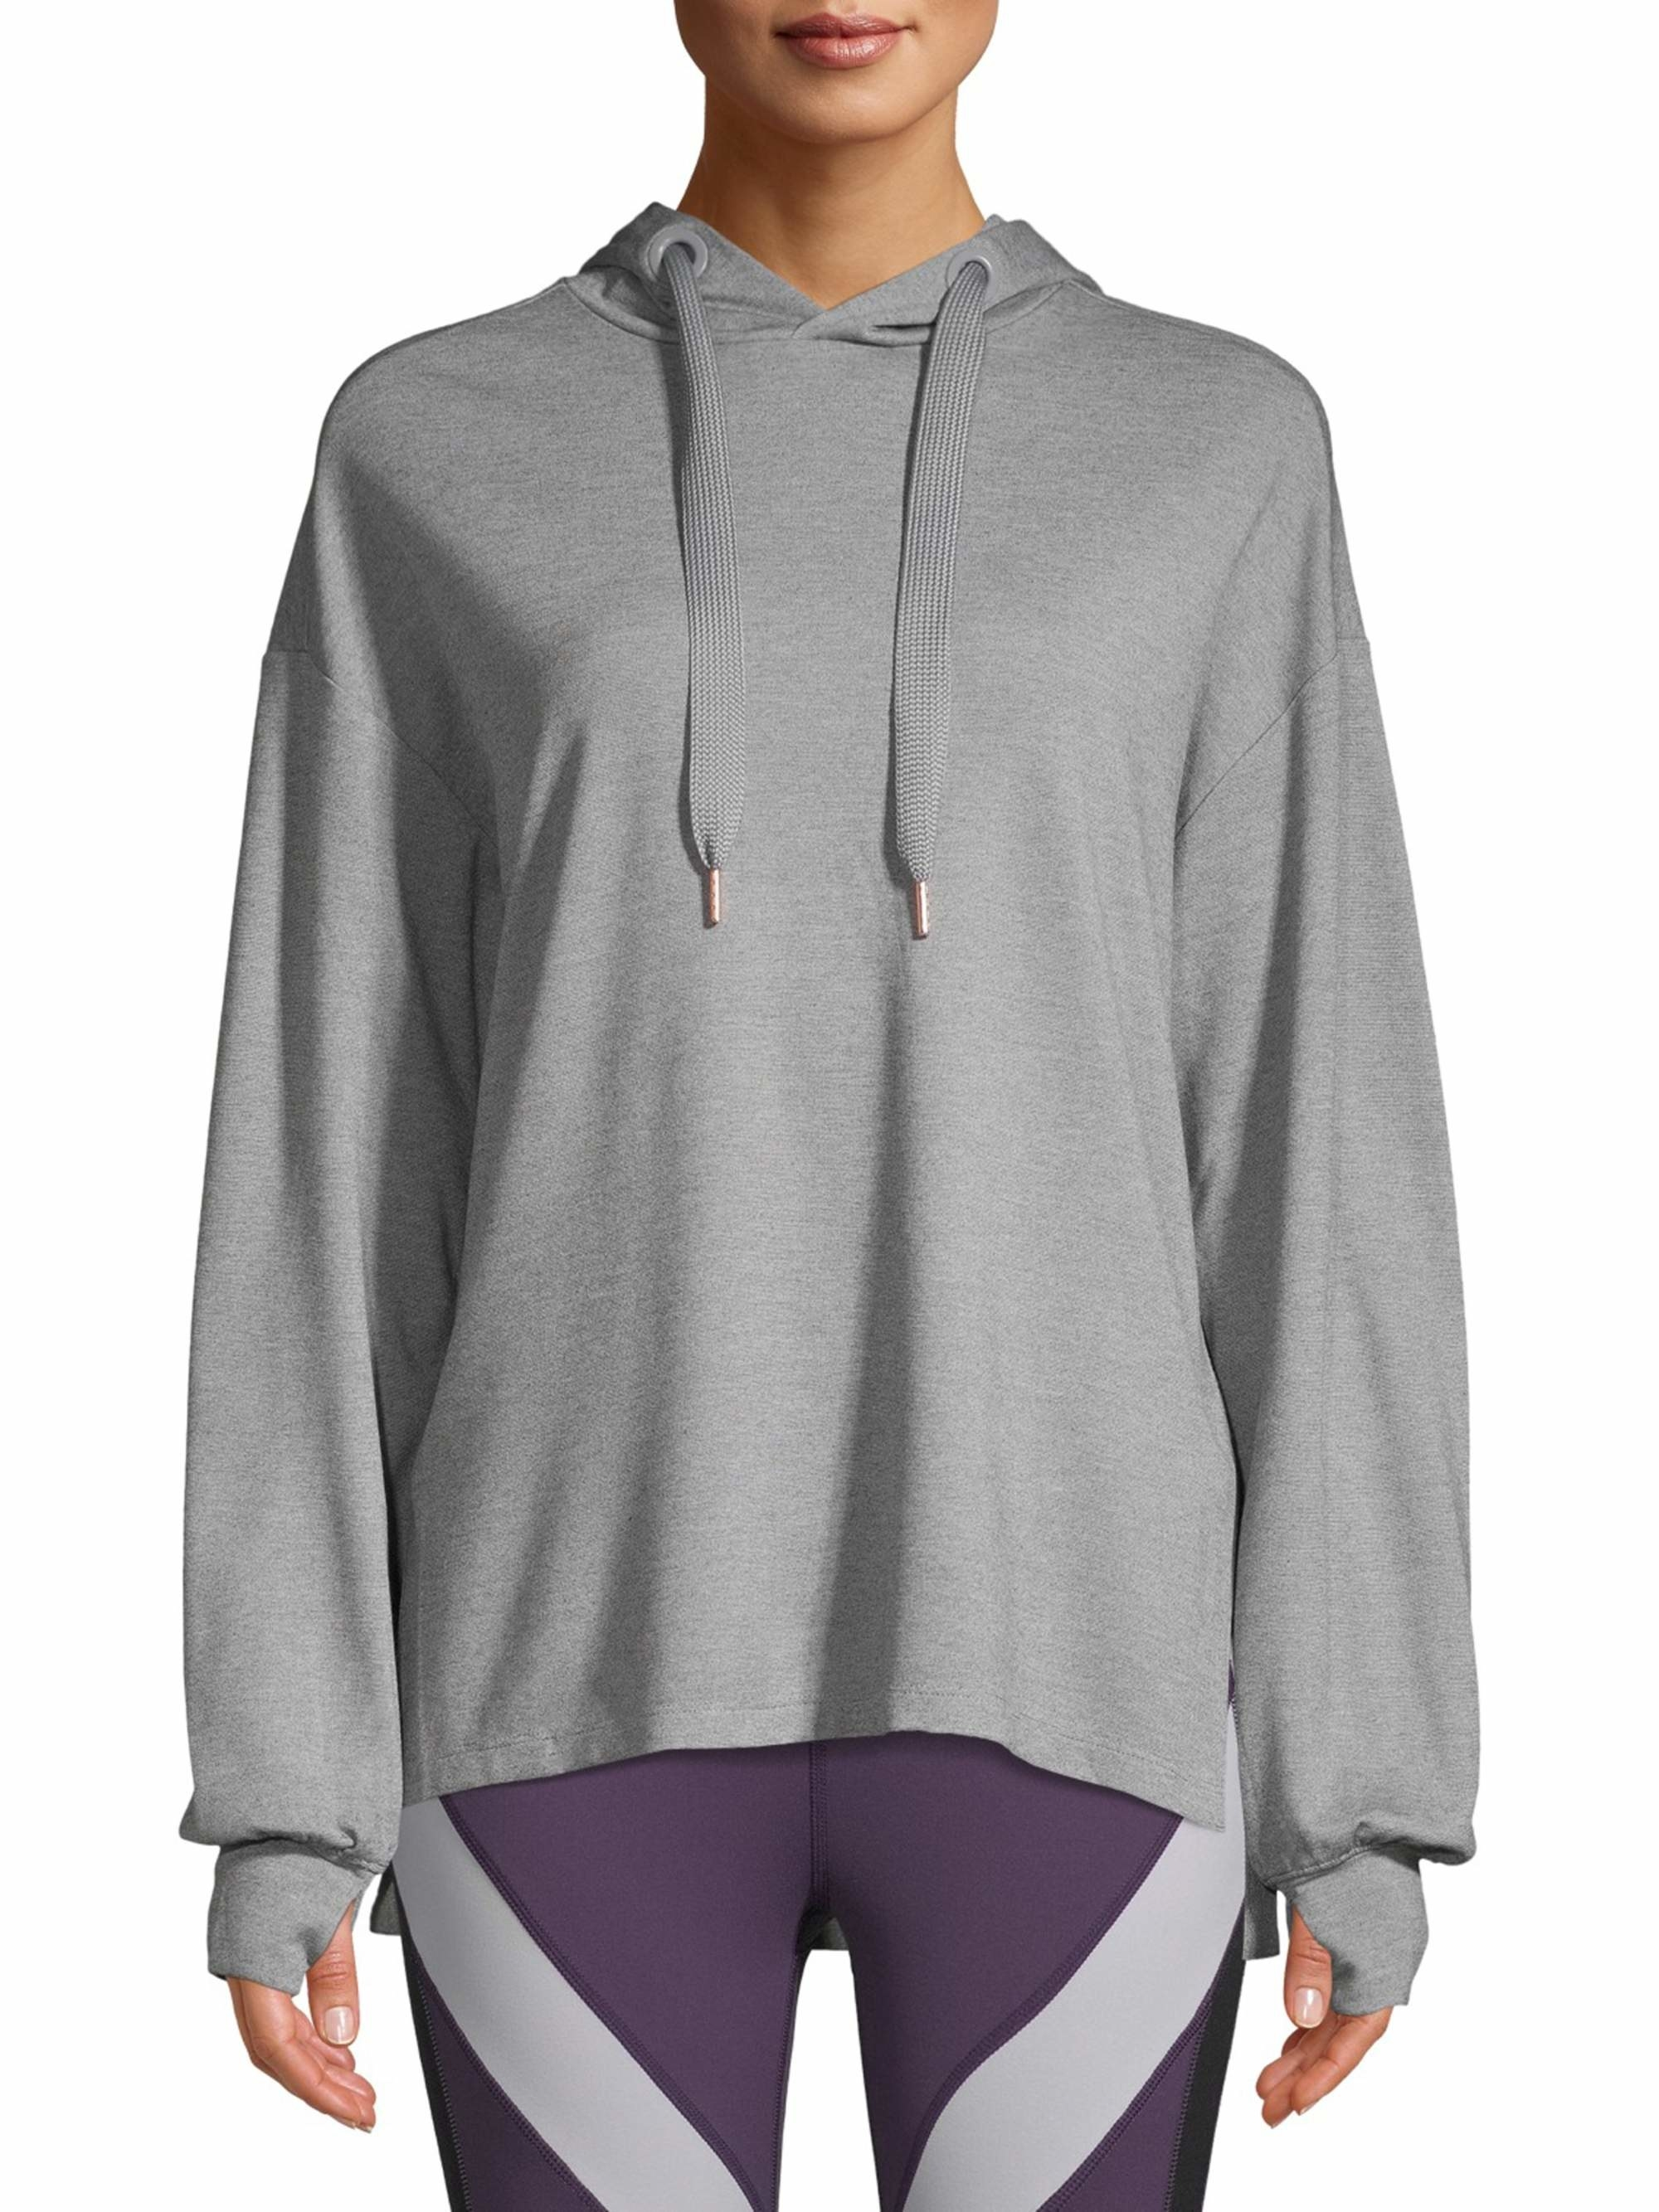 a model in the hoodie in grey